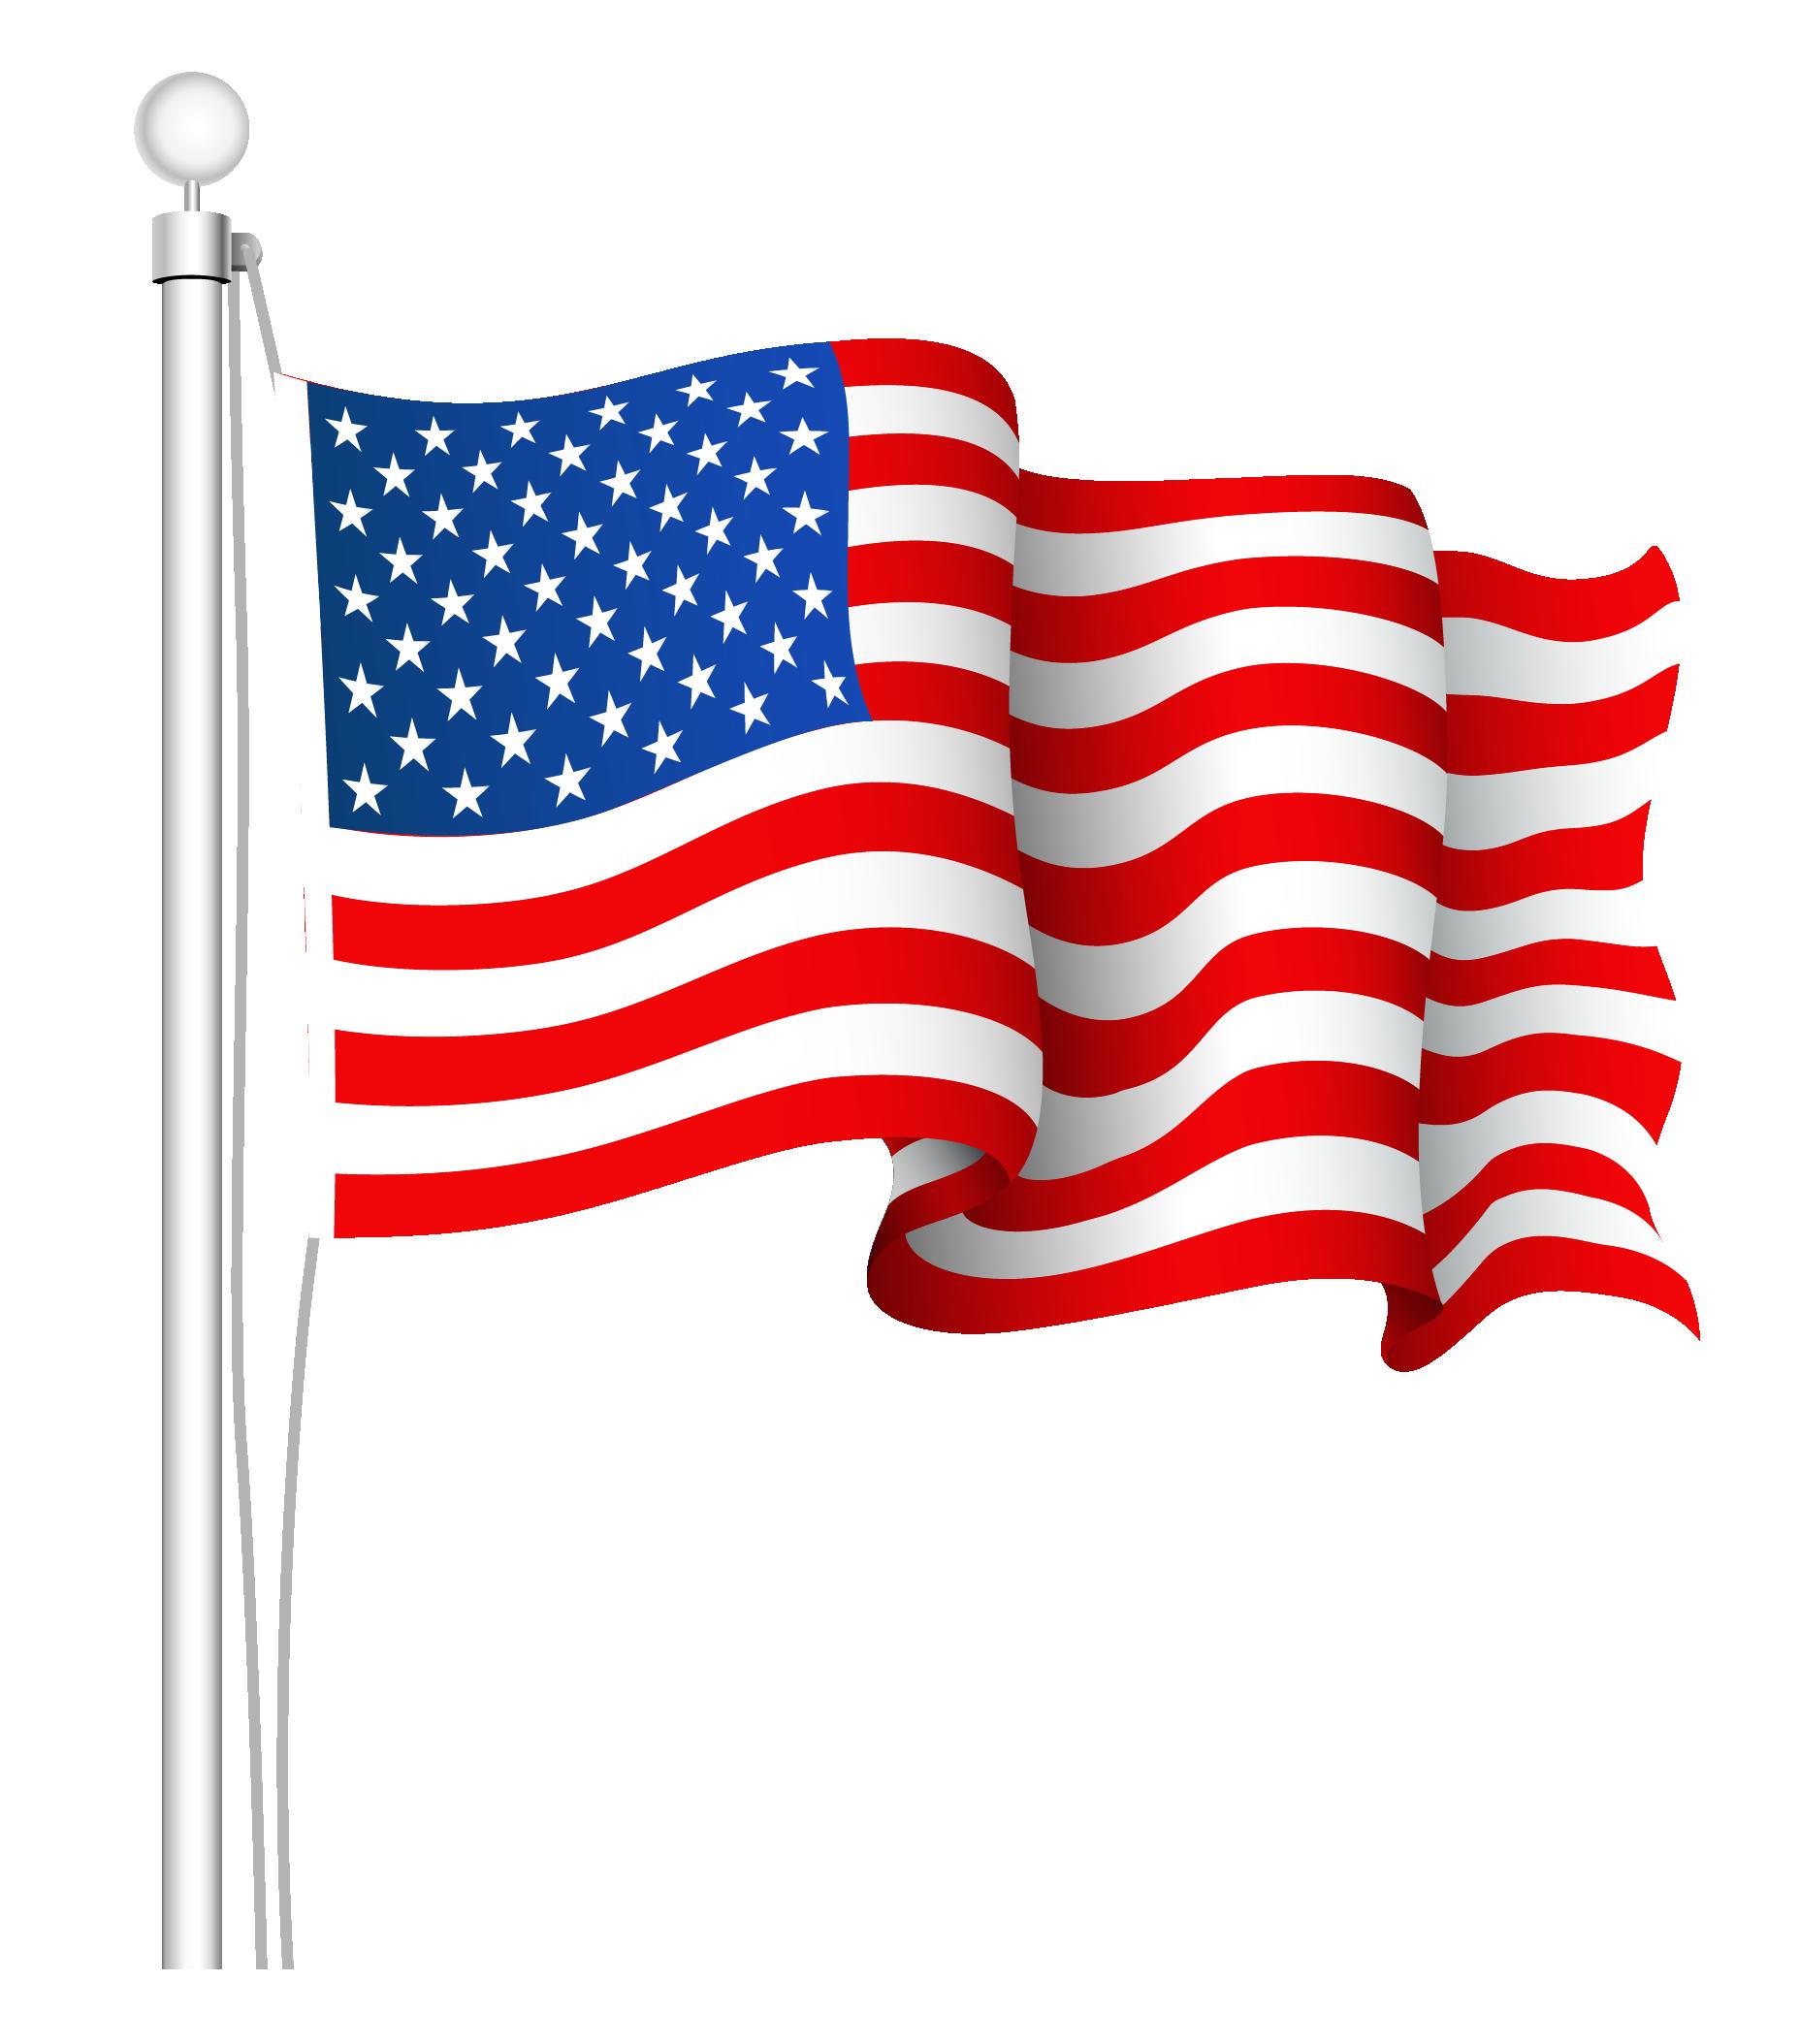 United States Flag Clip Art Cliparts Co-United States Flag Clip Art Cliparts Co-6